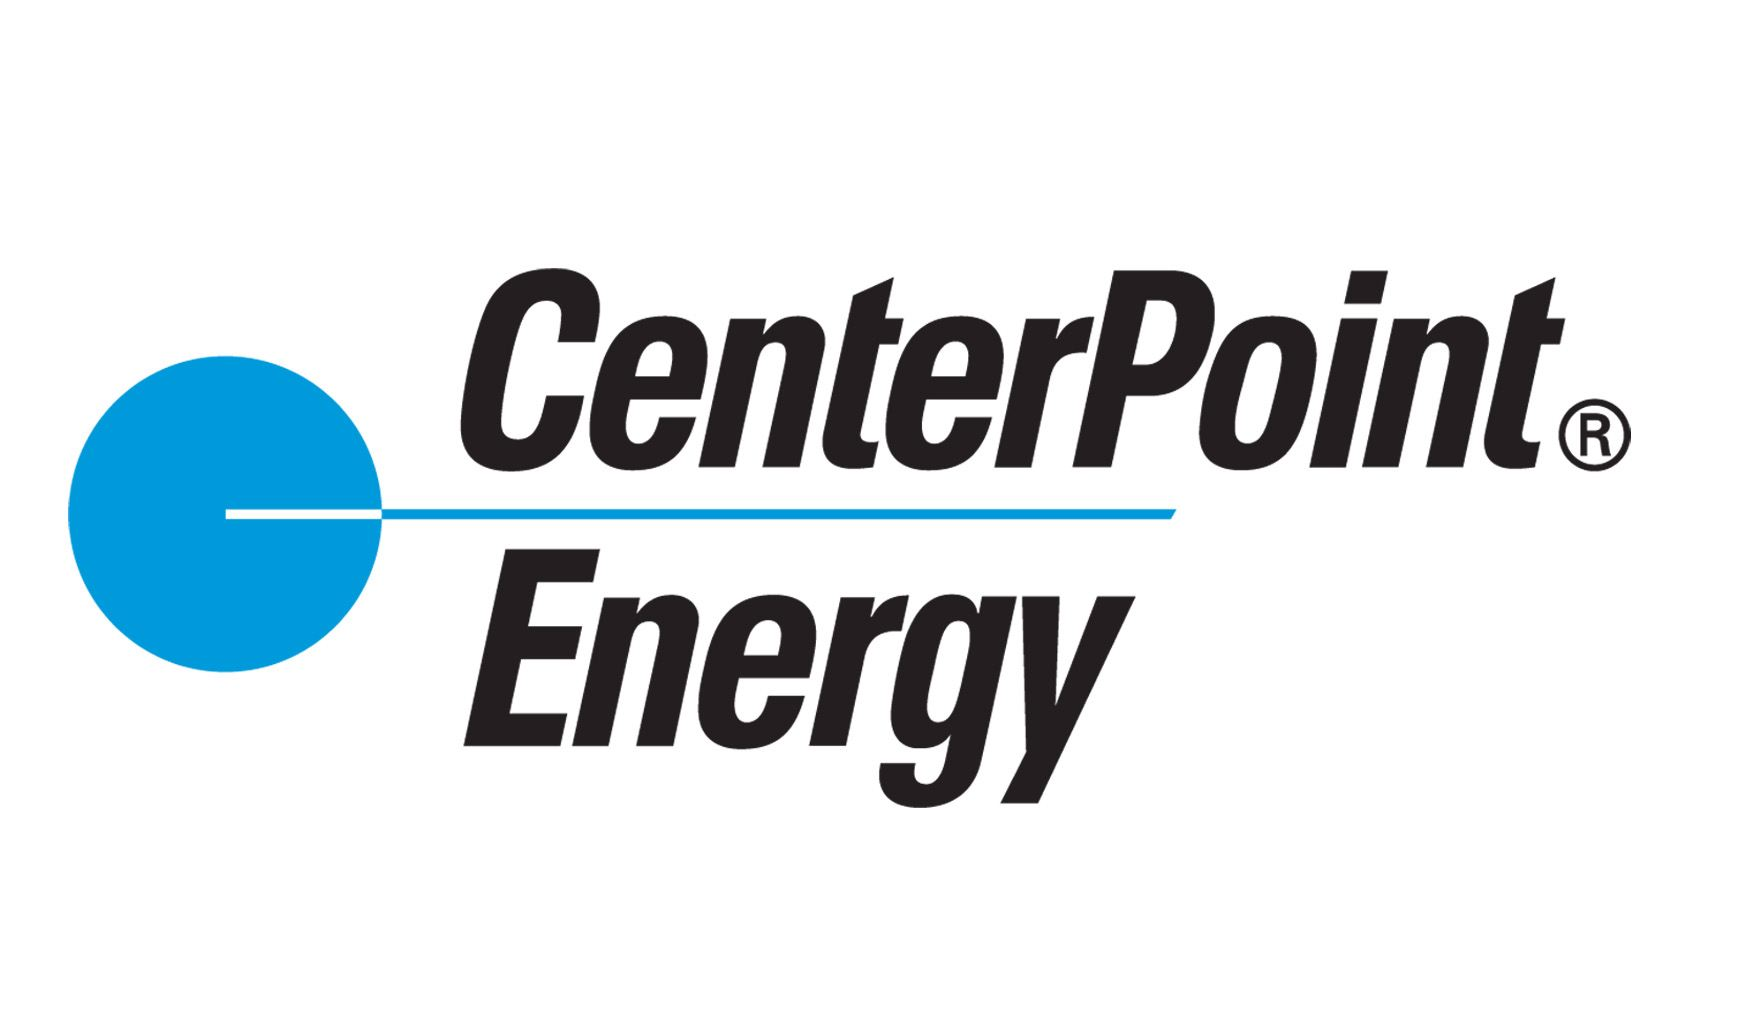 CenterpointEnergy.jpg